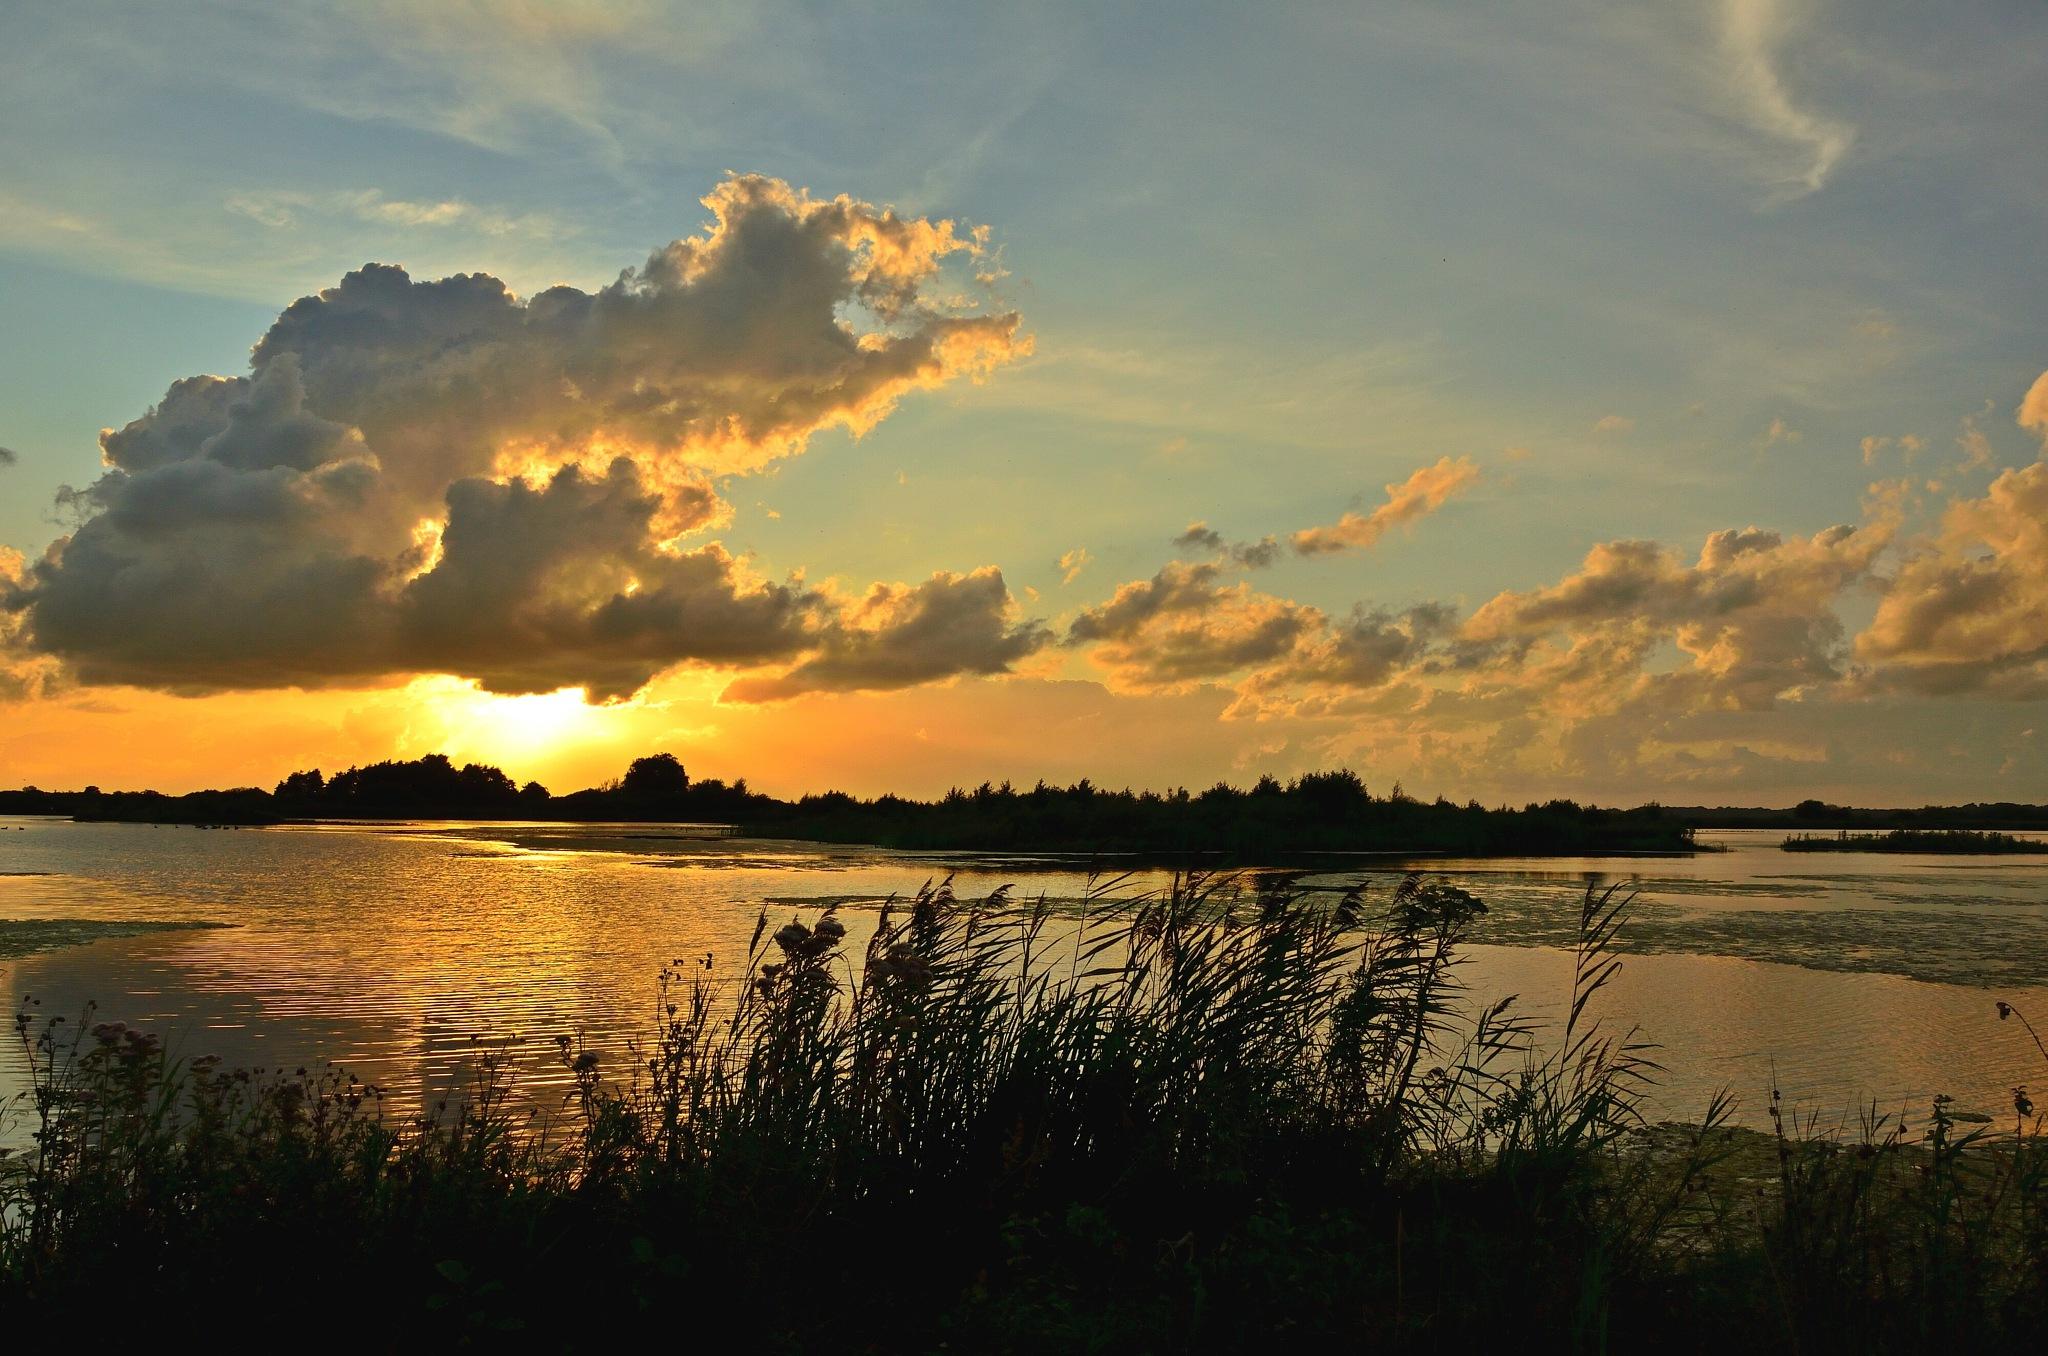 Sunset Zuidlaardermeer  by Henk Meima